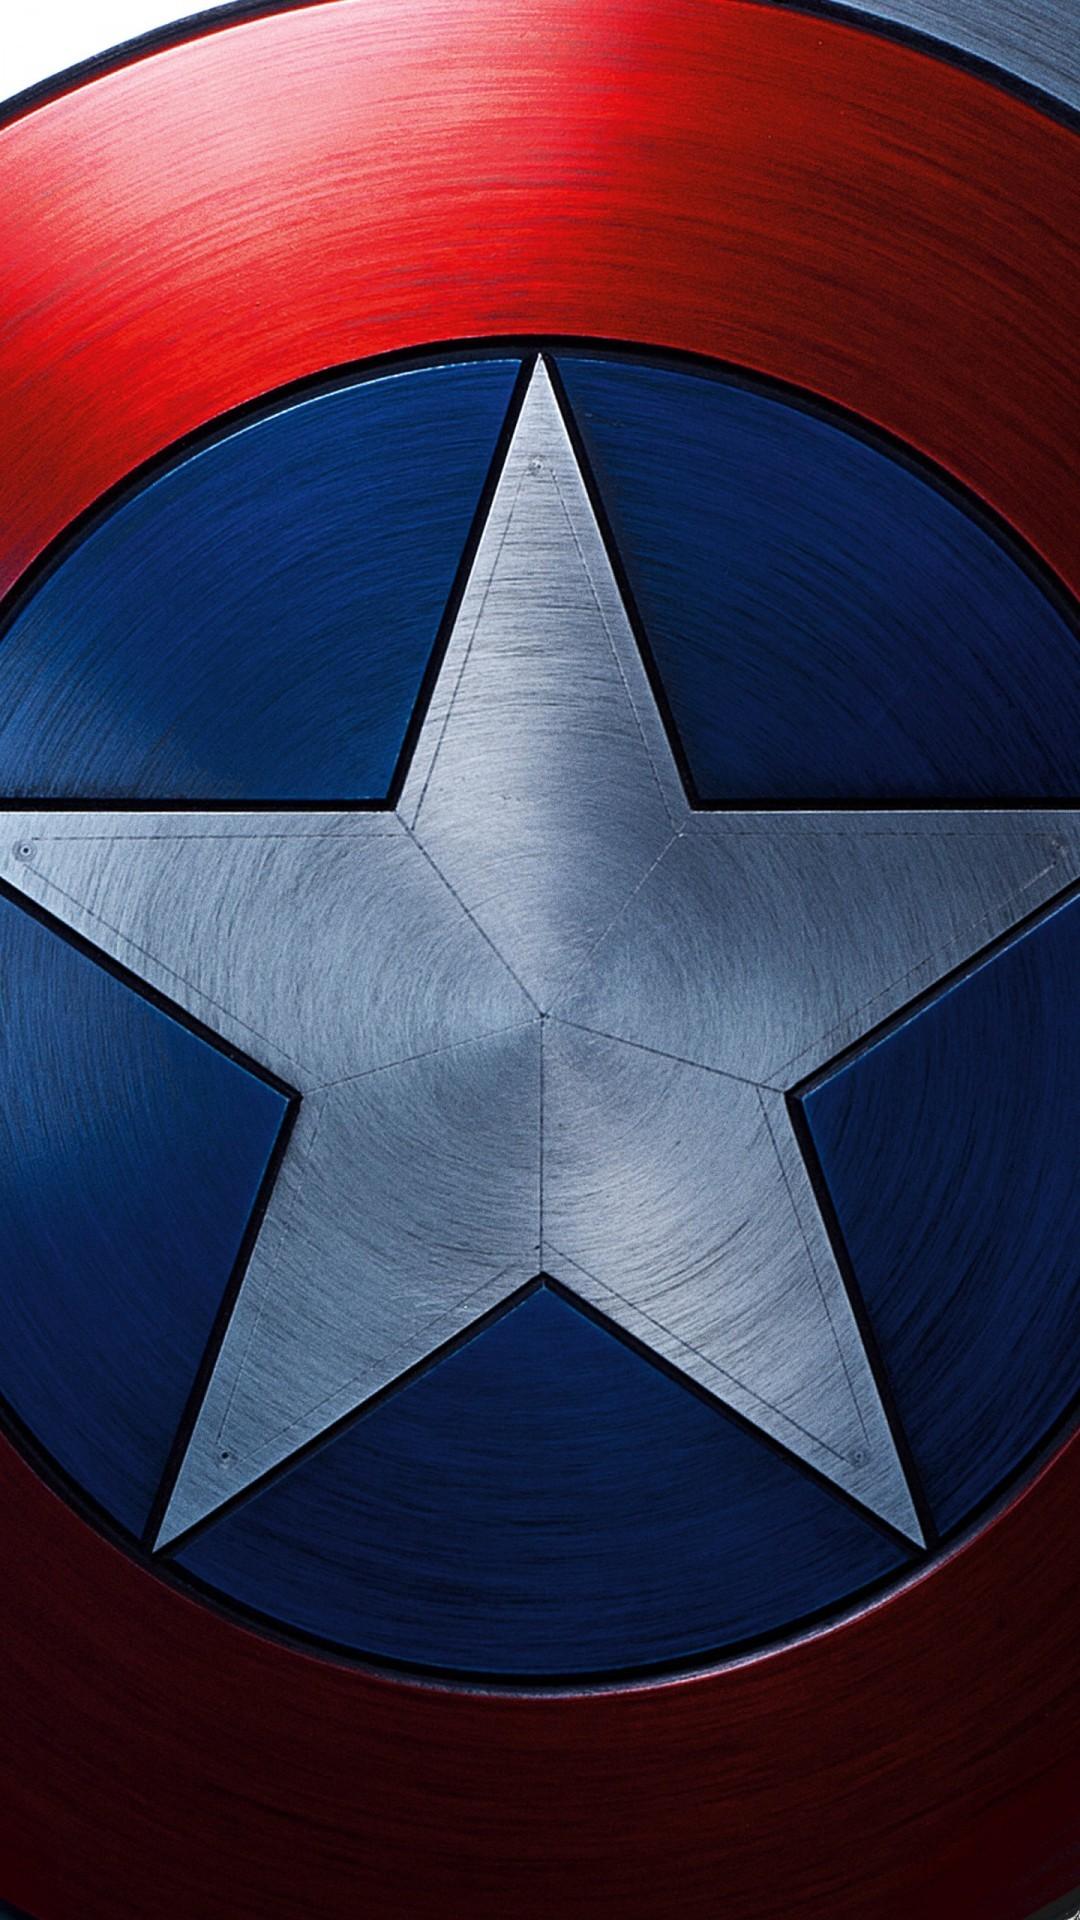 Captain America Civil War Hd Wallpapers For Iphone 6 Plus